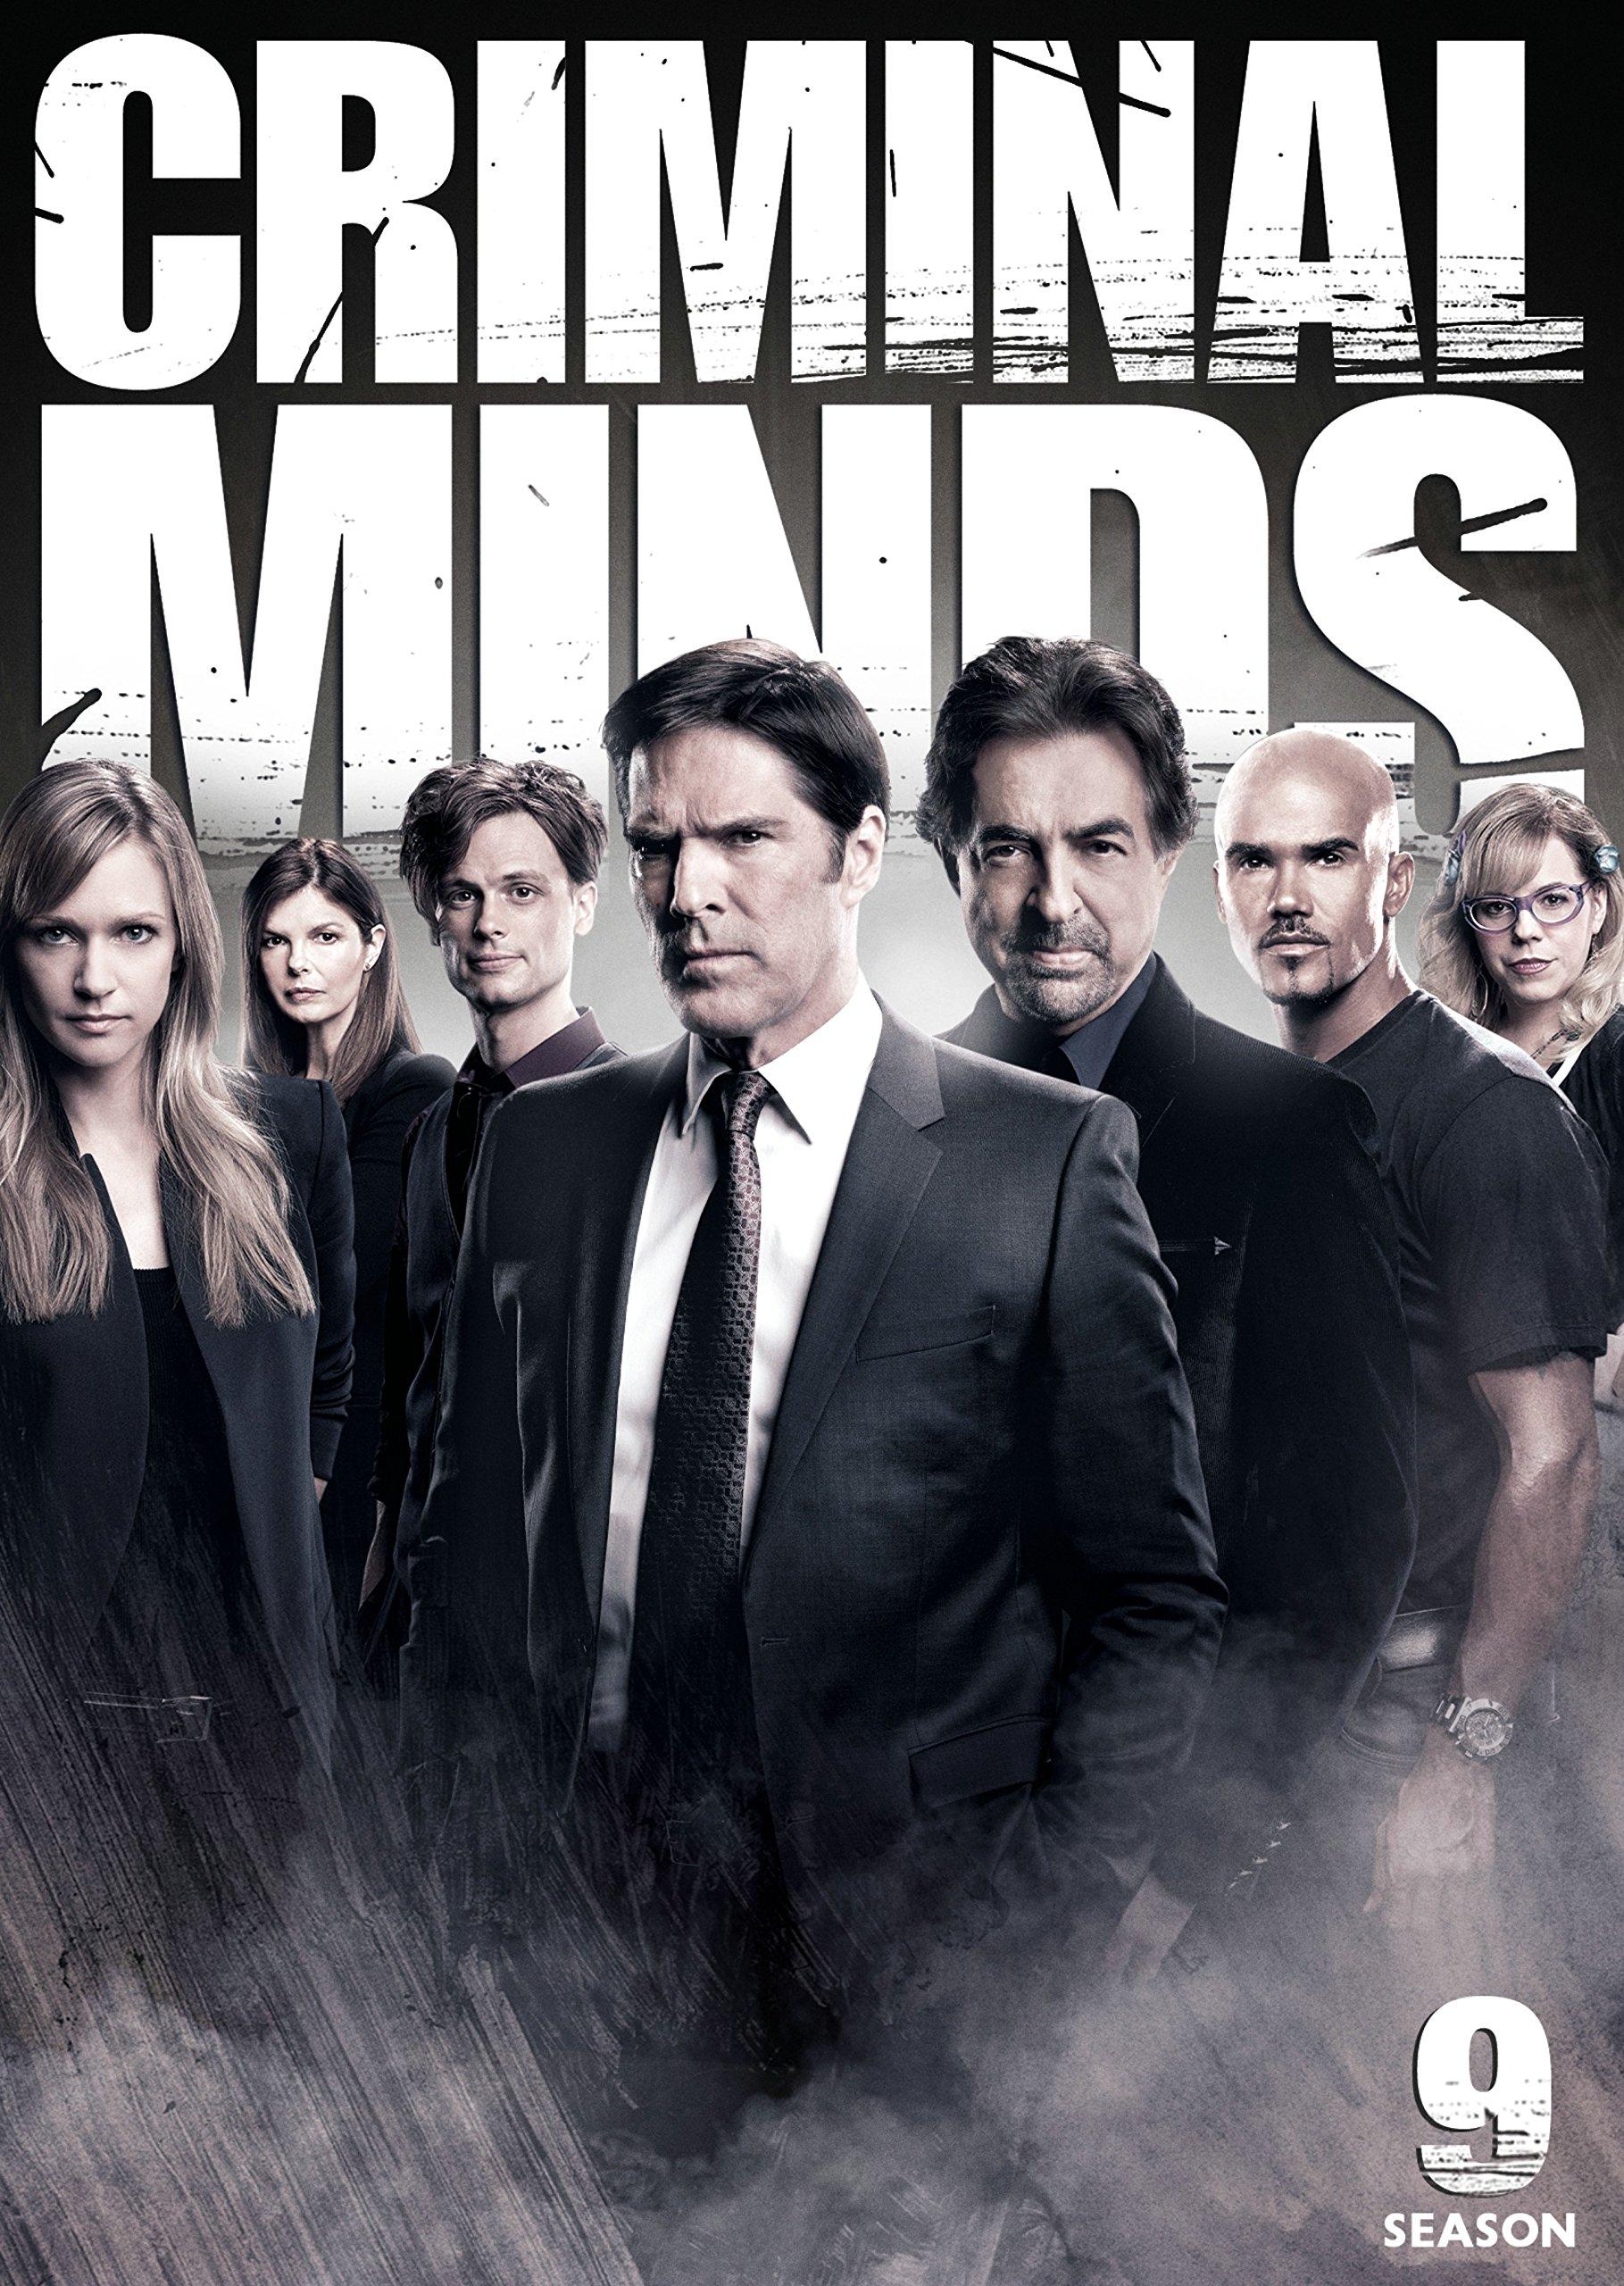 Anexo:9ª temporada de Mentes criminales